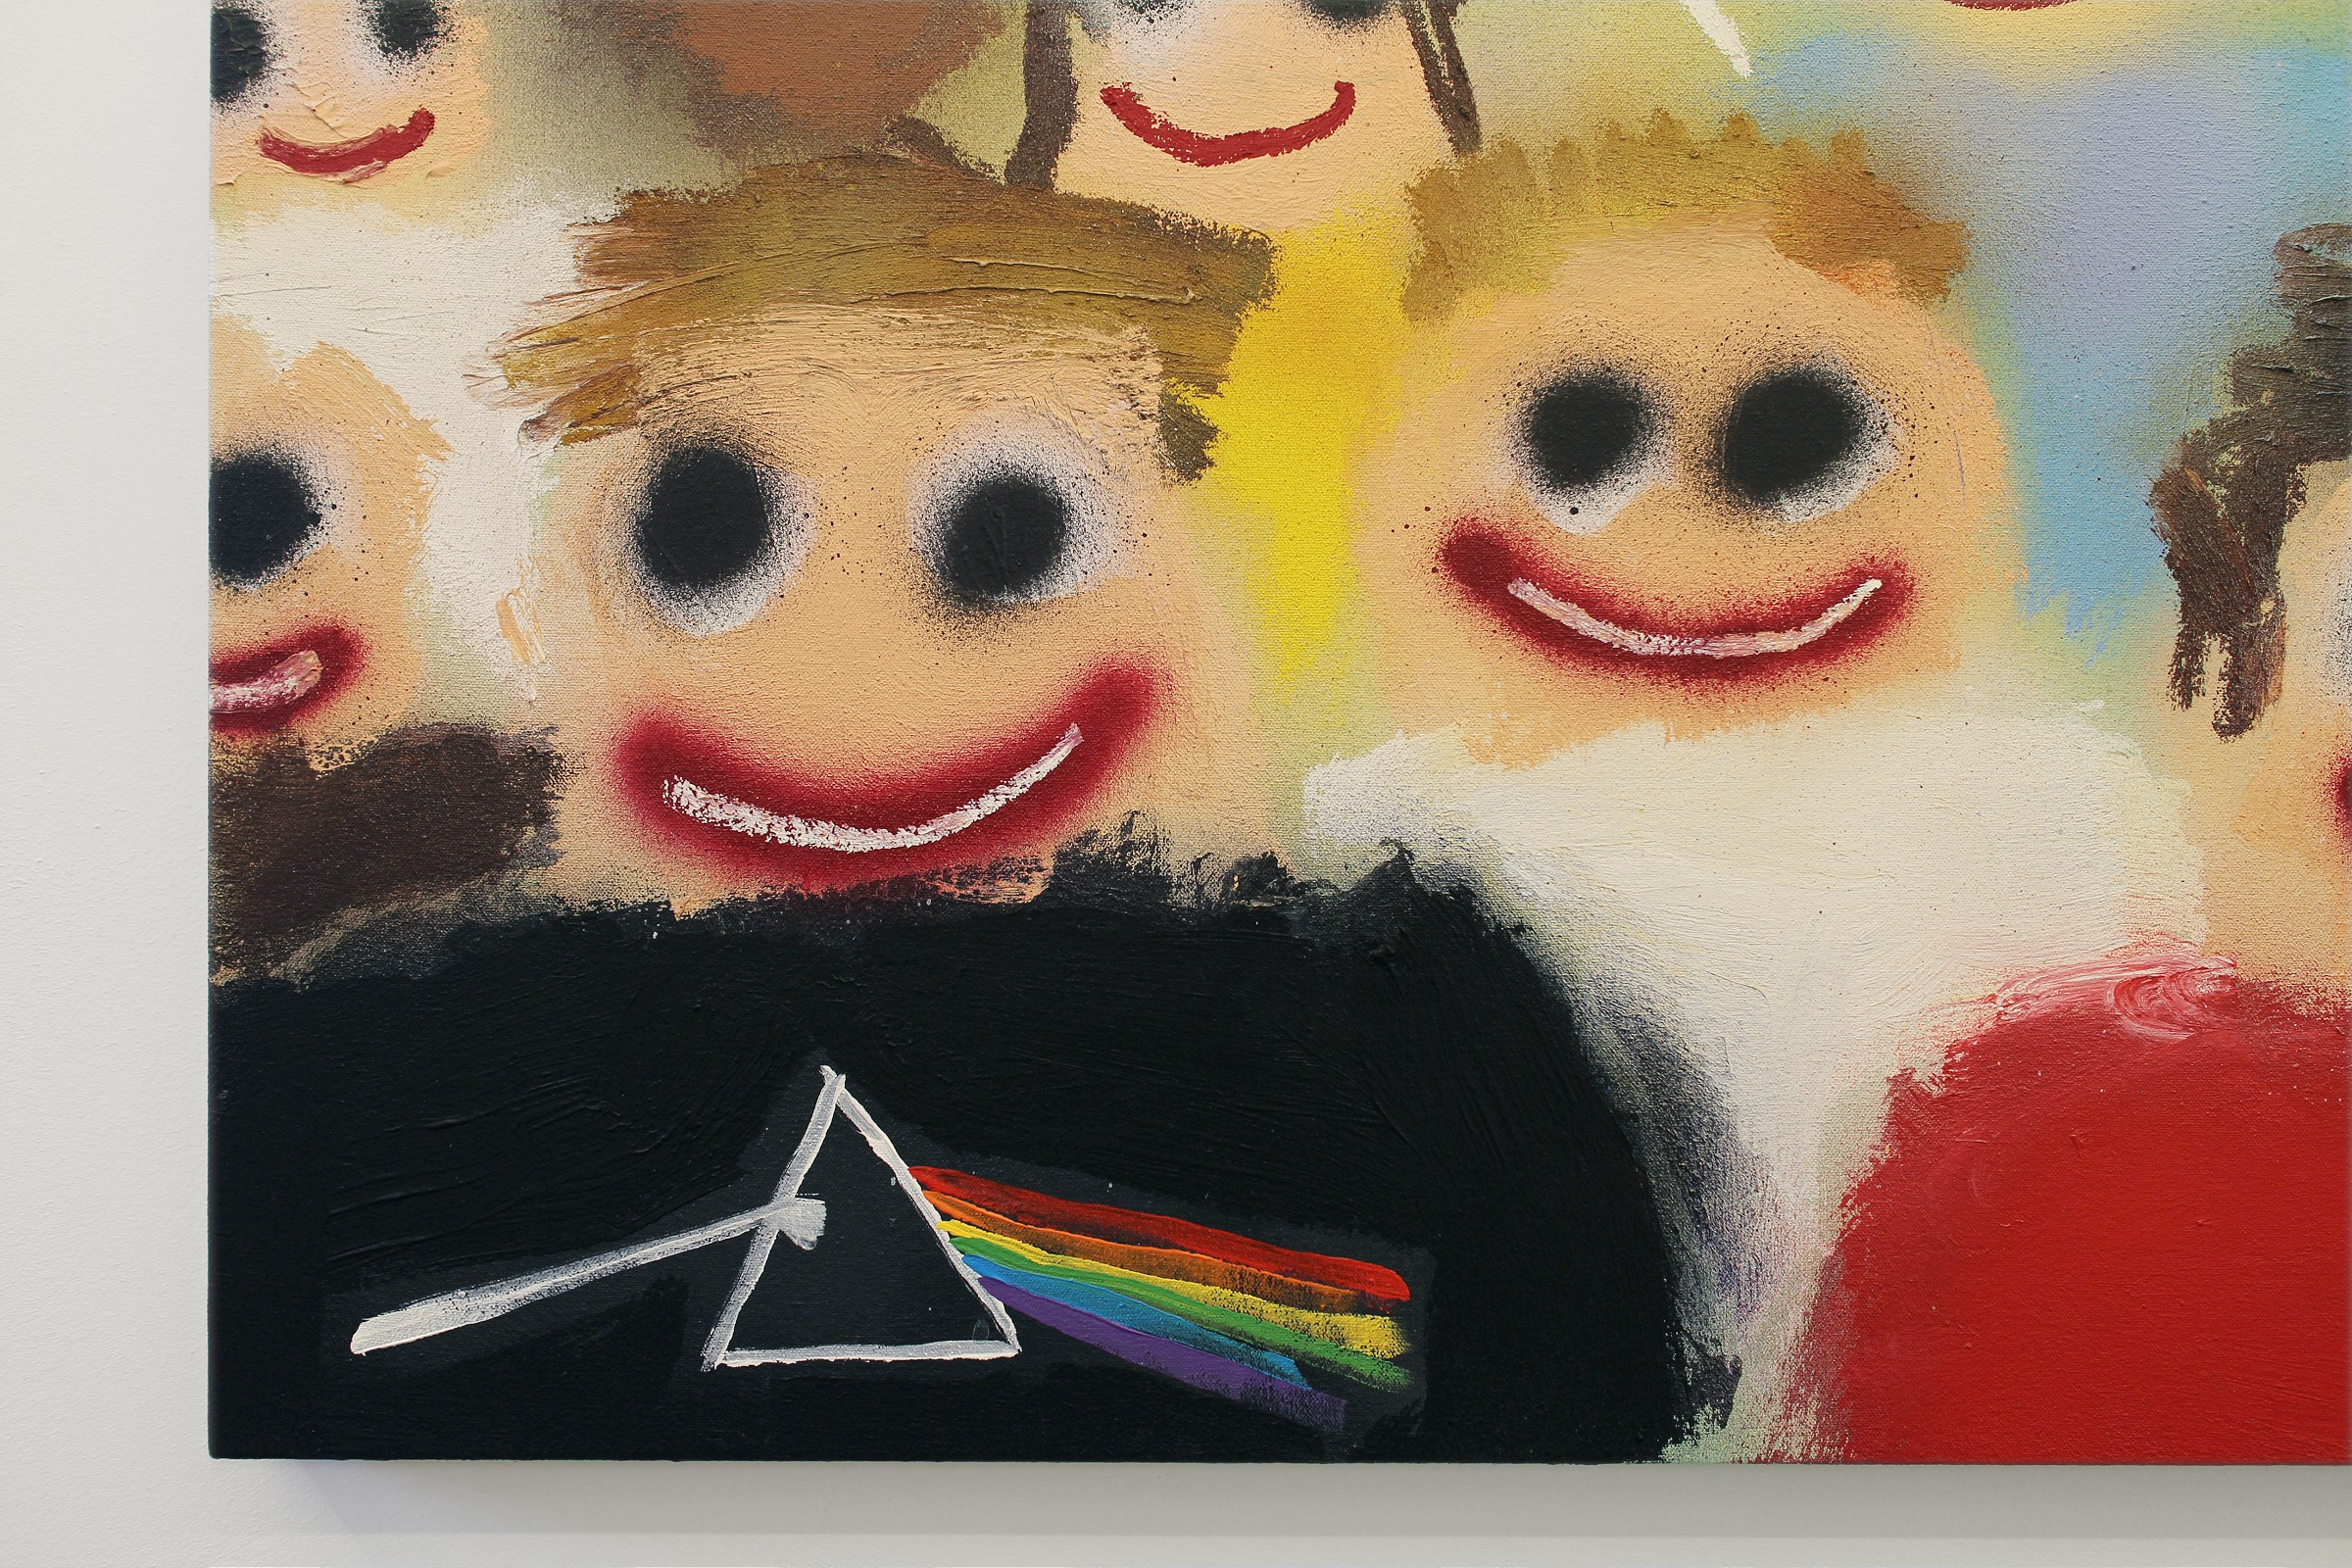 """DontGiveADamns"" na galeria Marian Cramer Projects Artes & contextos dontgiveadamns39"